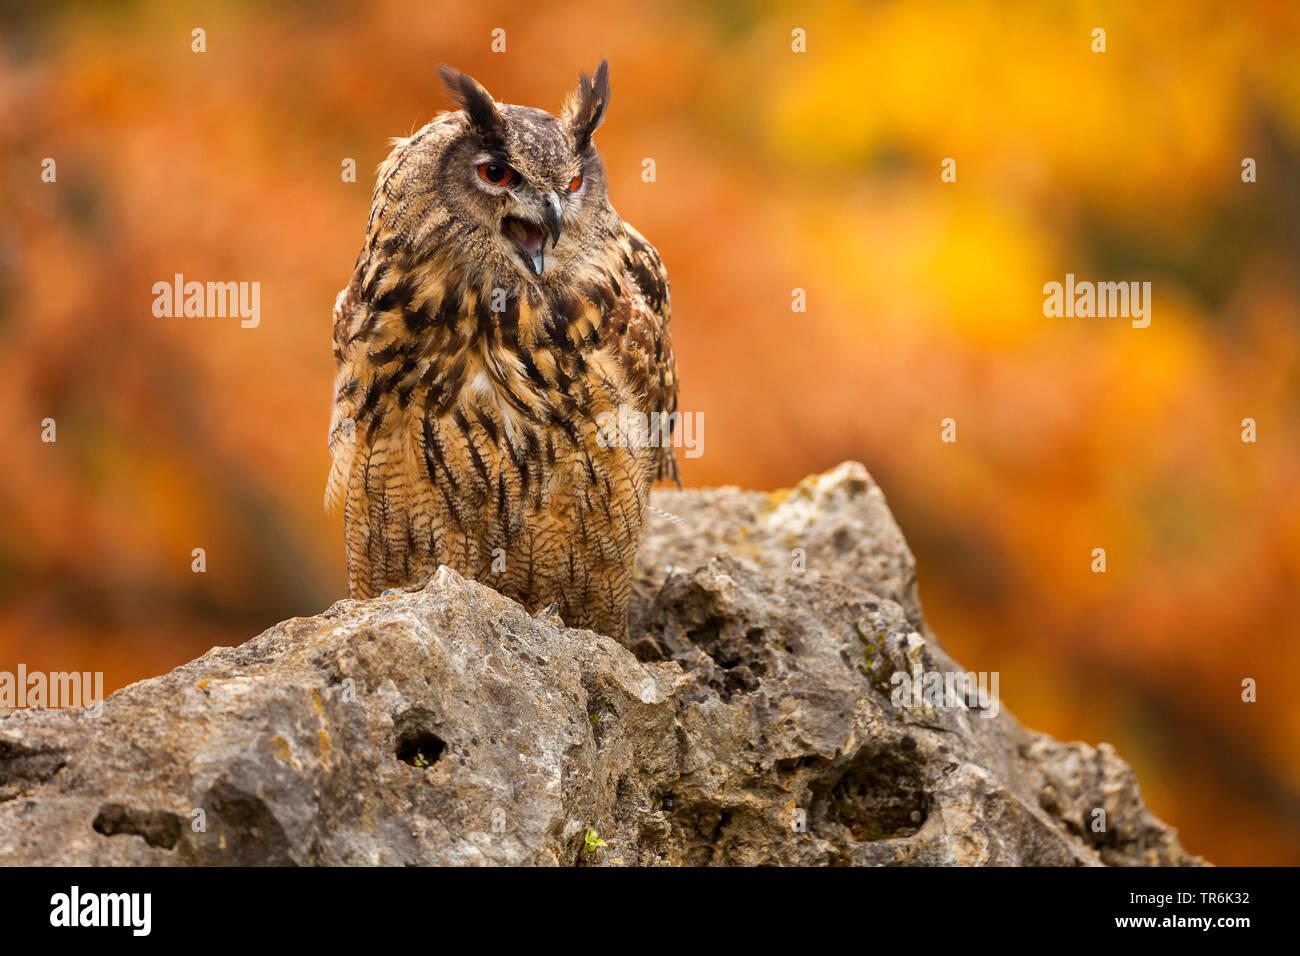 northern eagle owl (Bubo bubo), sitting on a rock yawning, Germany - Stock Image